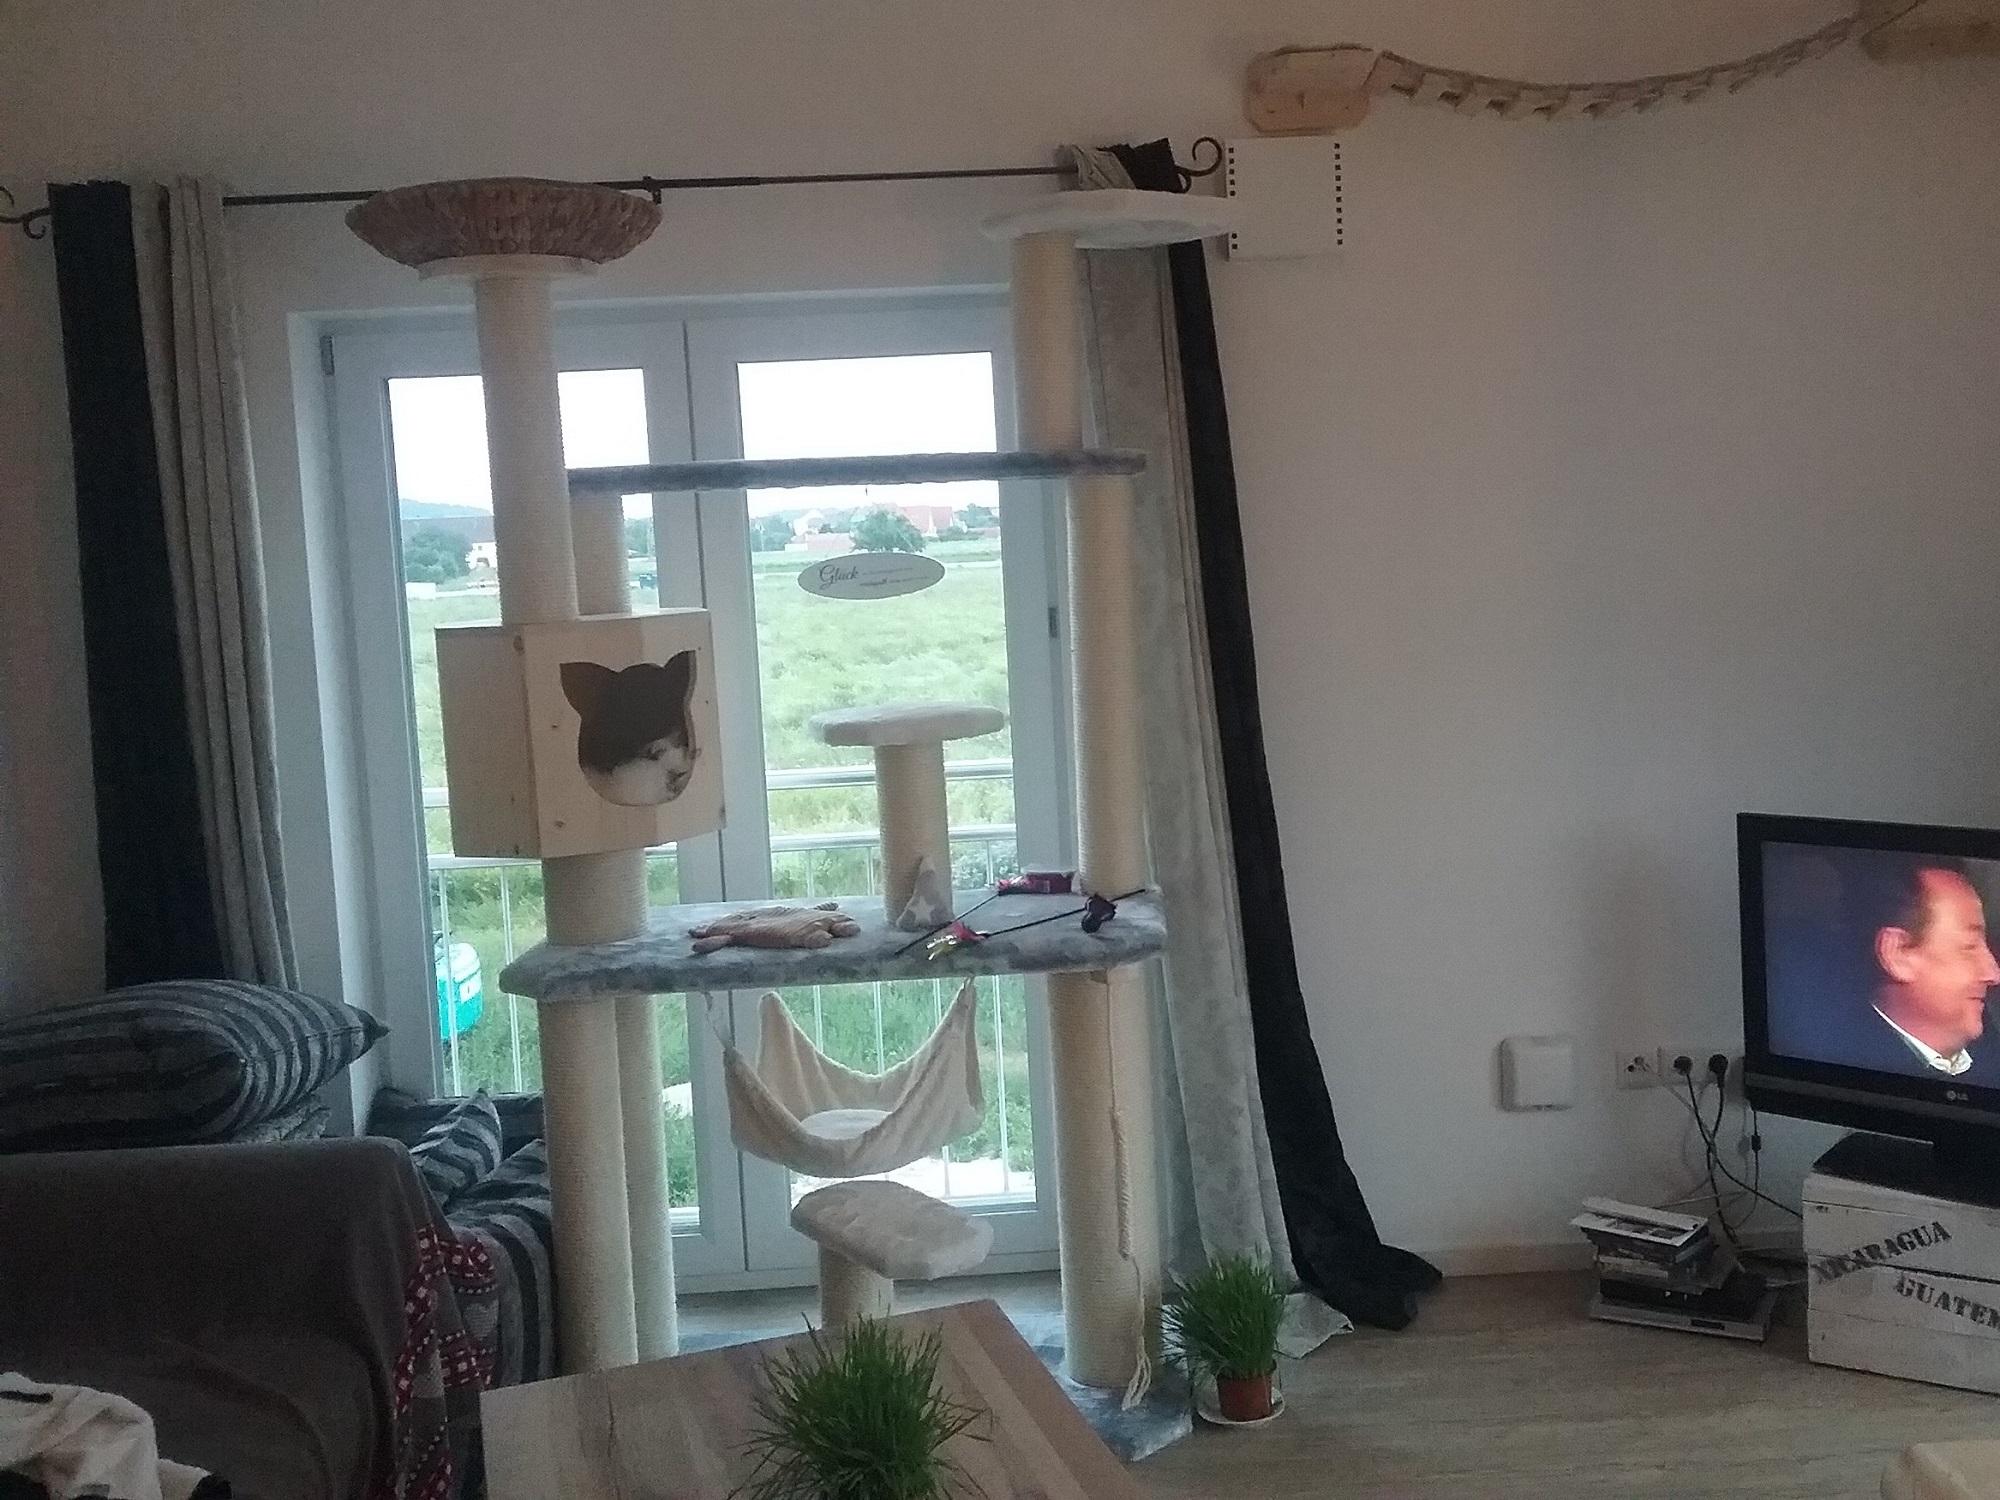 katzenbaum h hle kissen f r katzen liegemulde stabiler kratzbaum. Black Bedroom Furniture Sets. Home Design Ideas